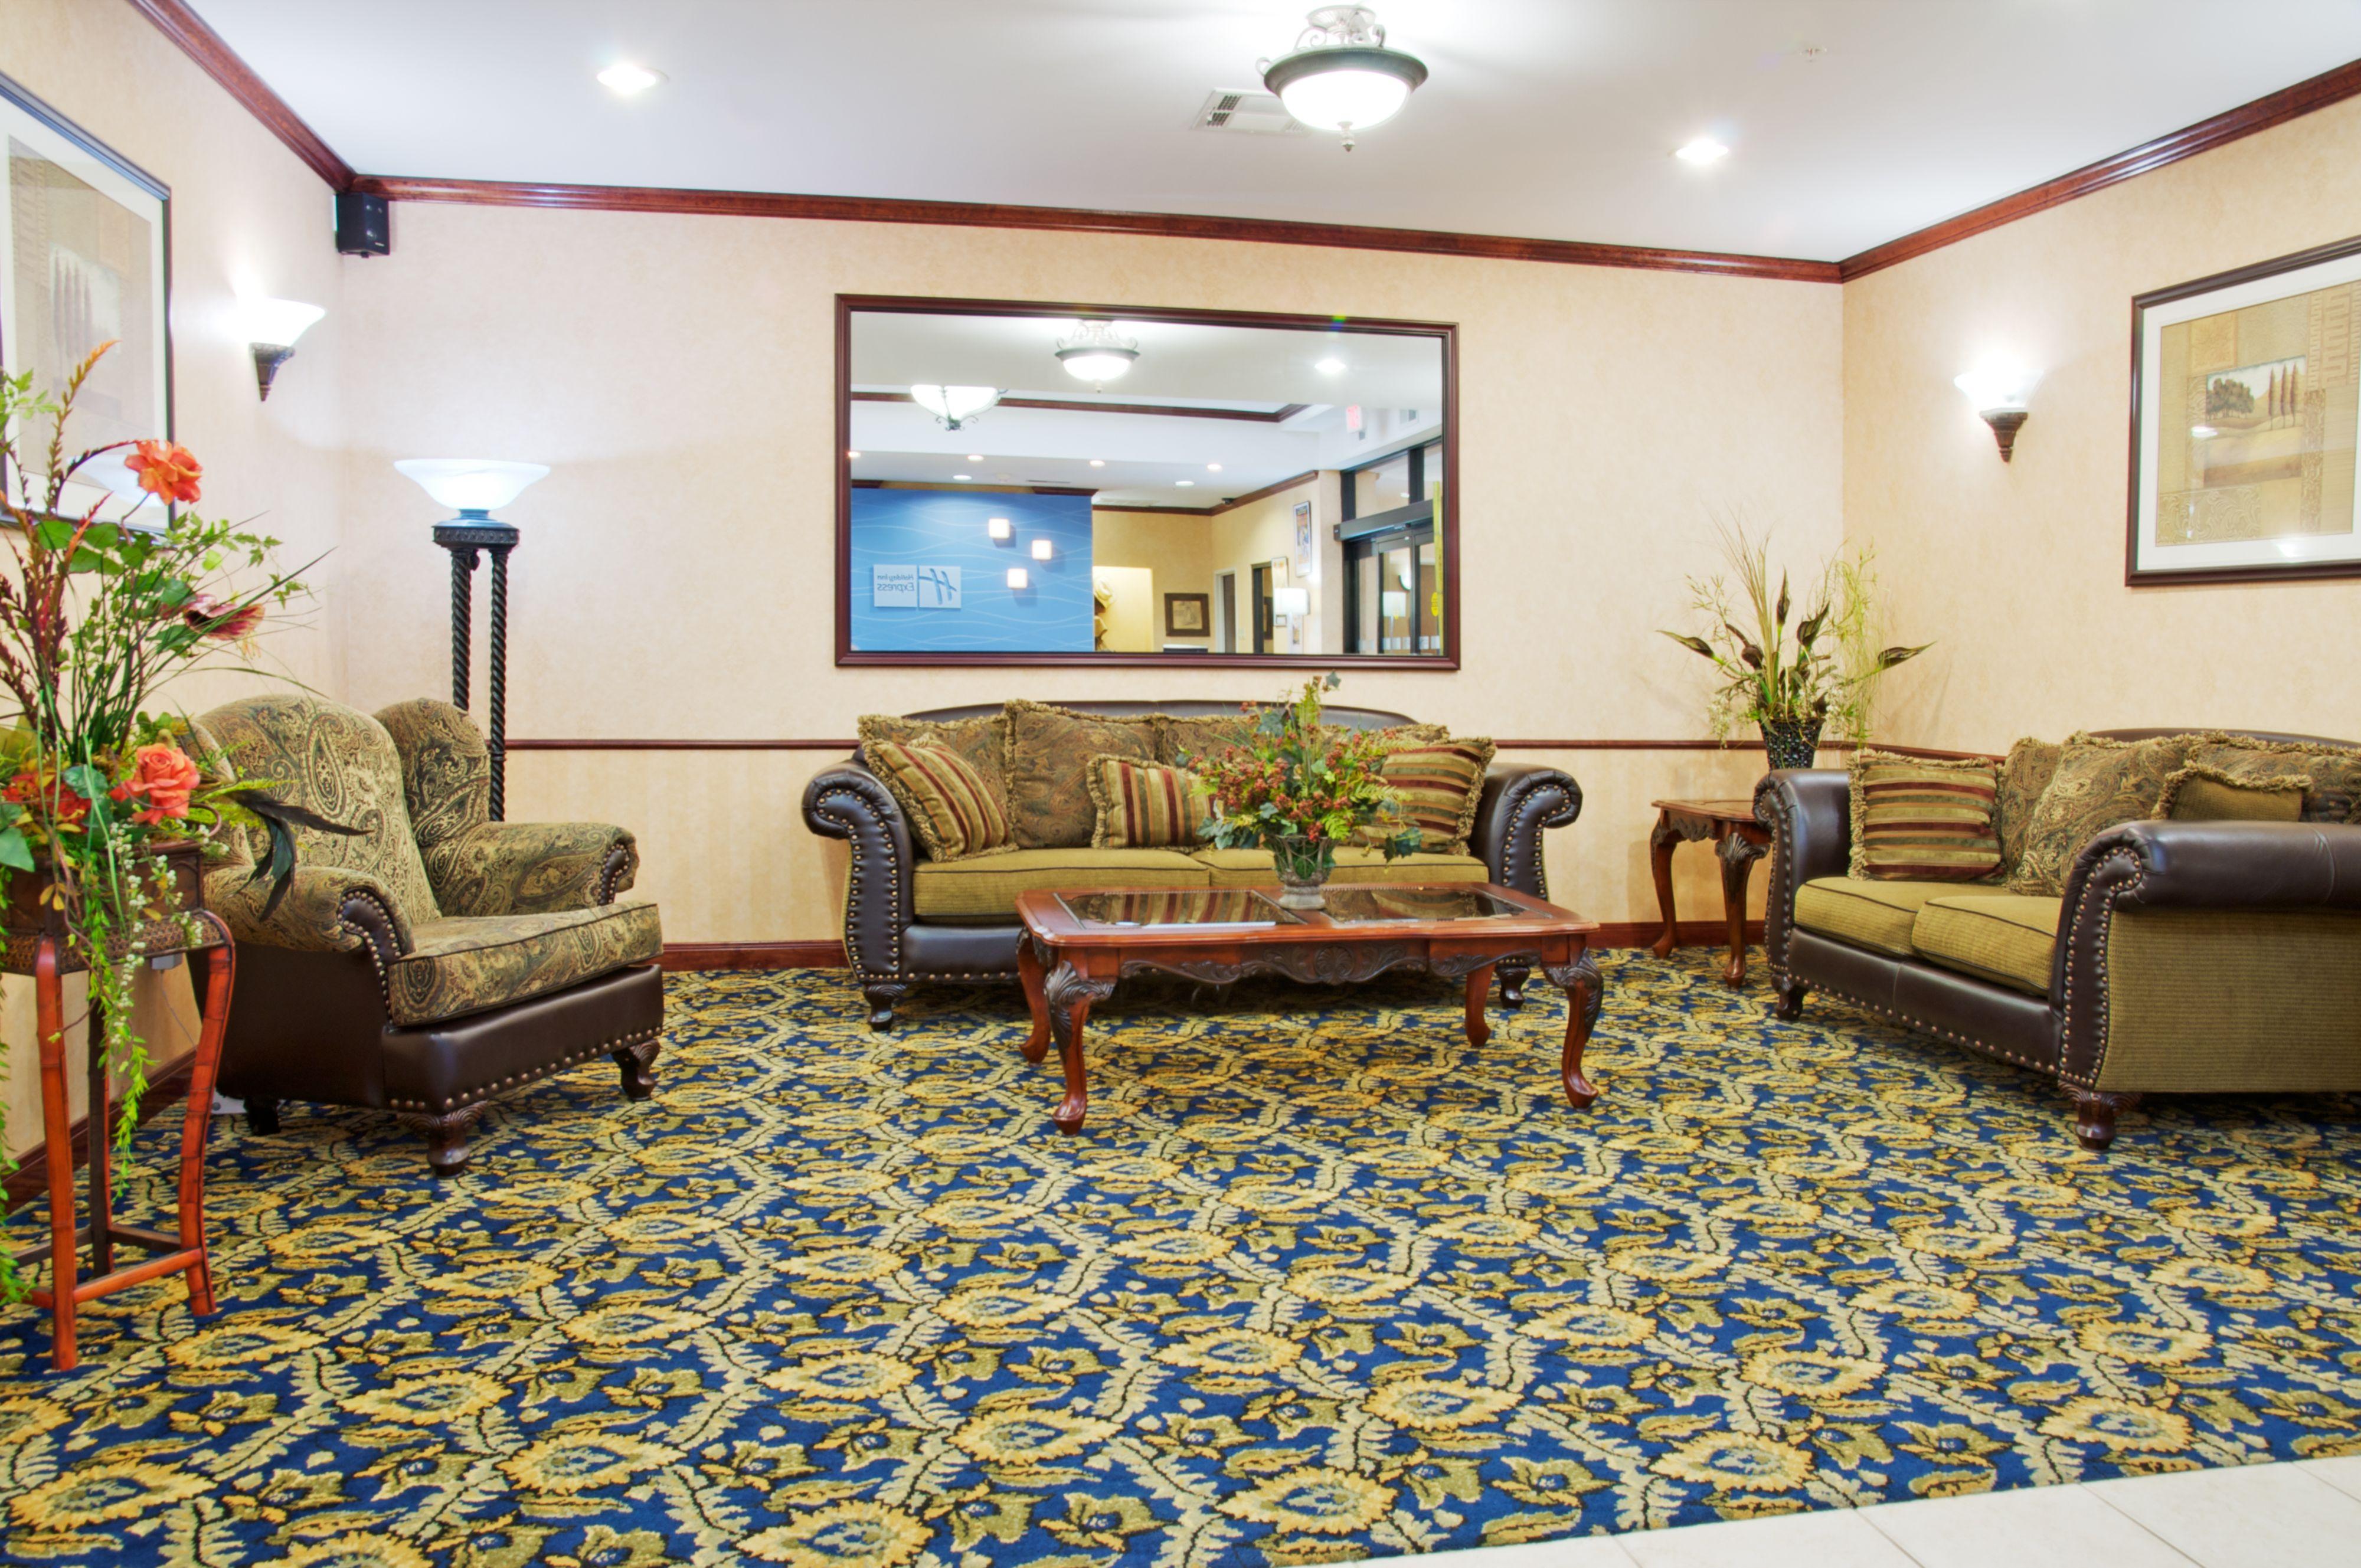 Holiday Inn Express Orange image 4